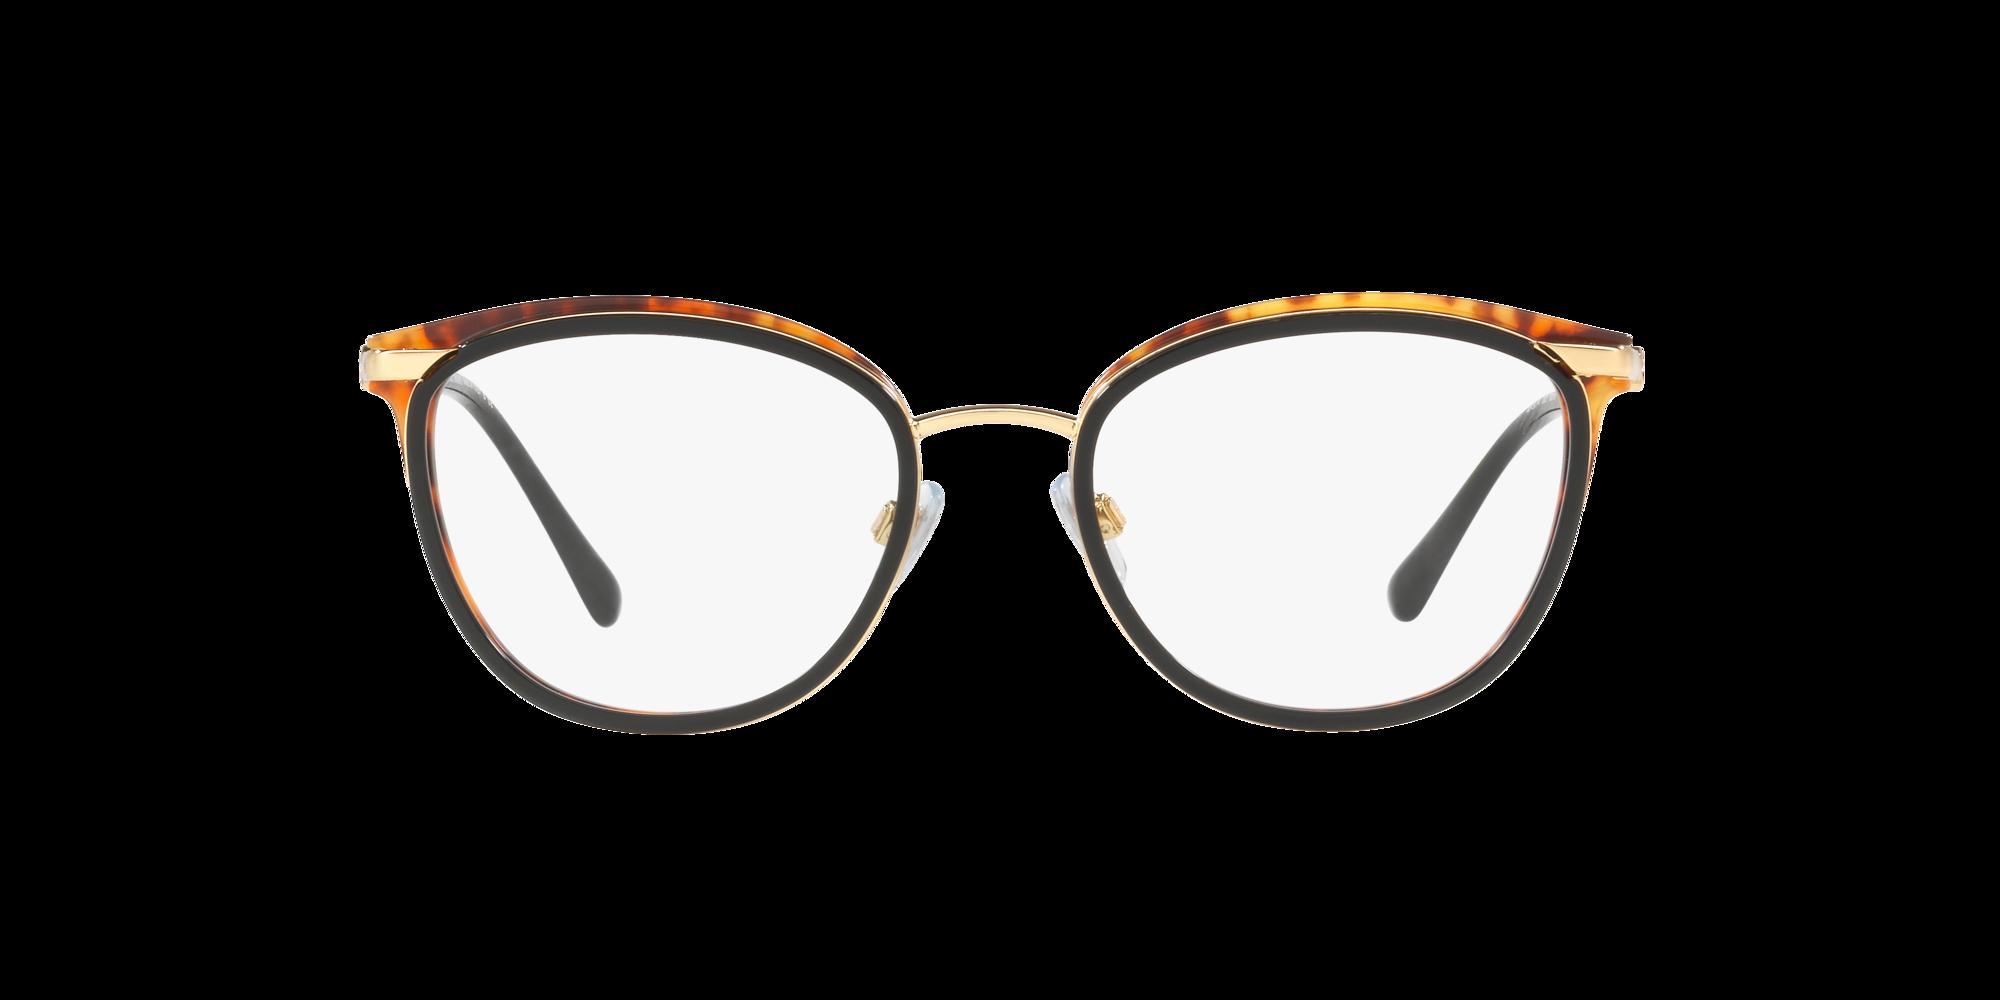 Image for AR5074 from LensCrafters | Glasses, Prescription Glasses Online, Eyewear